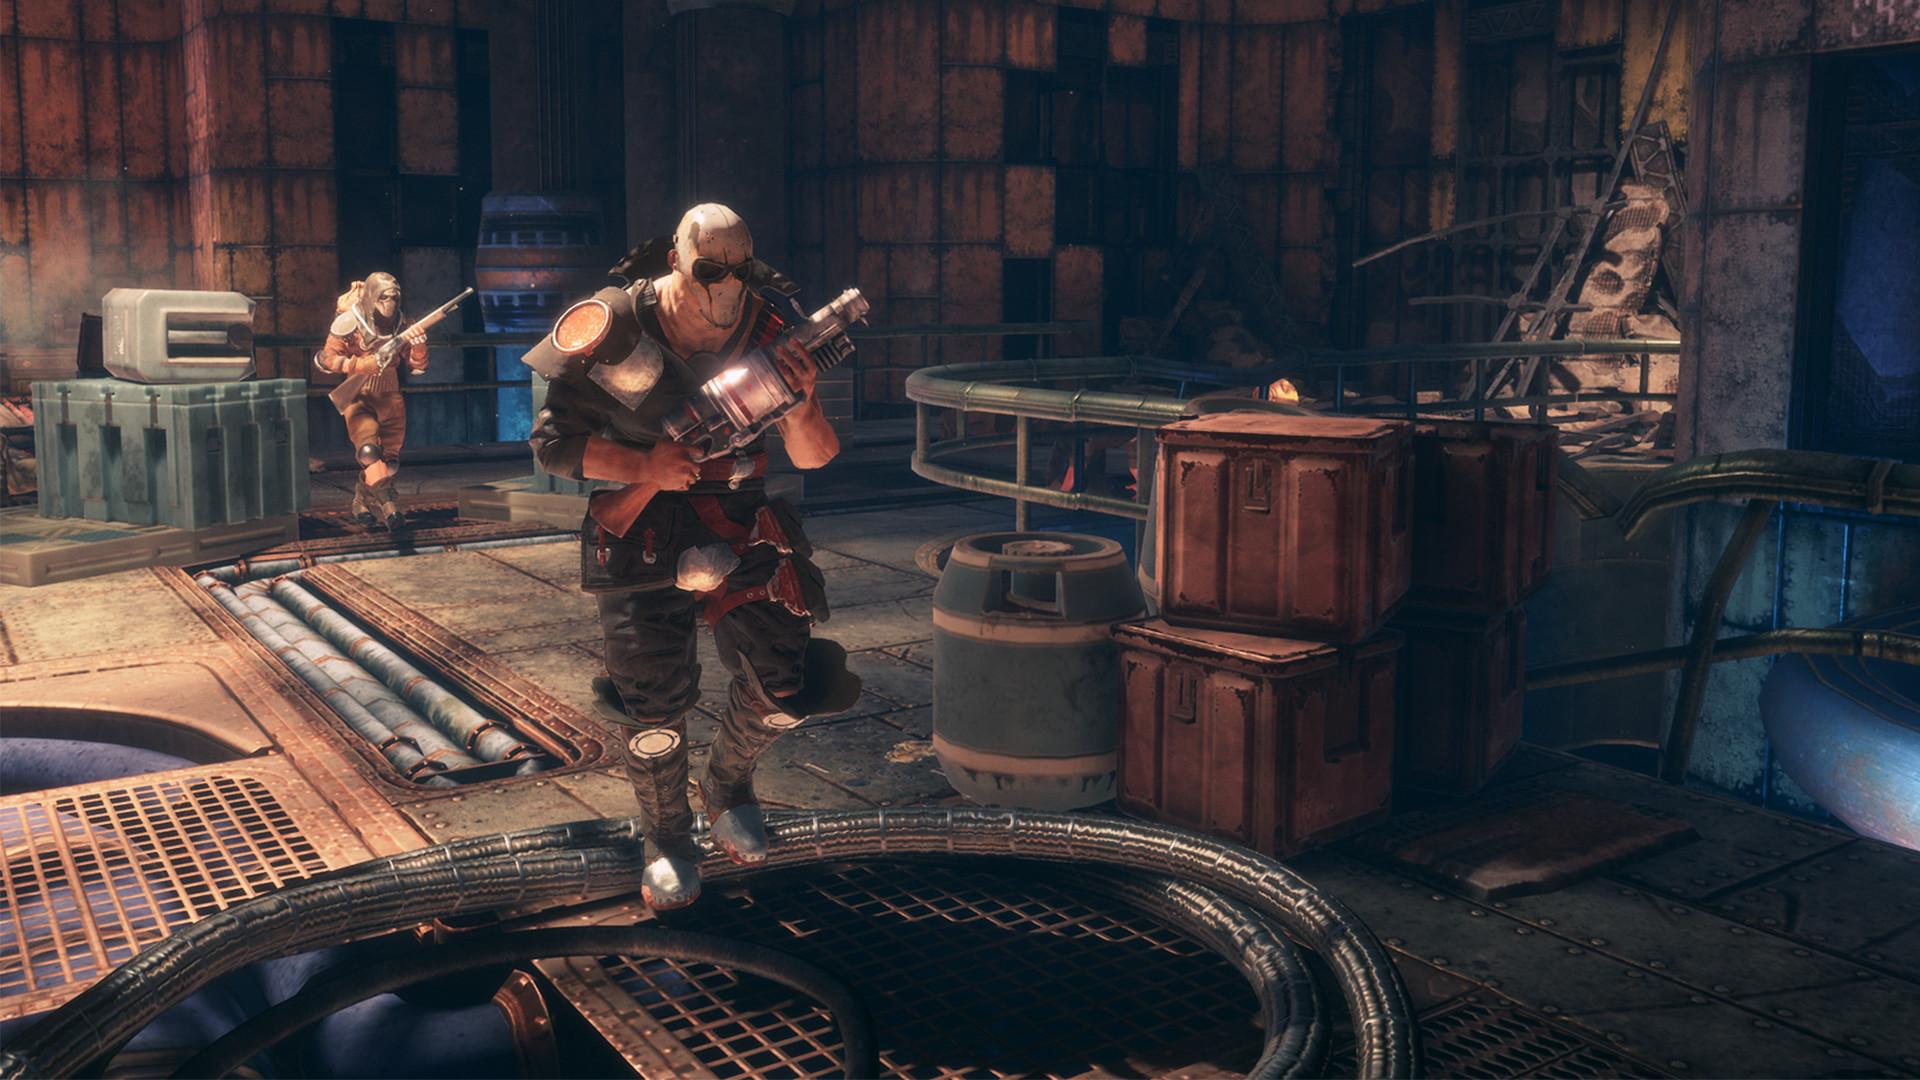 Insomnia: The Ark Screenshot 13 - Bilderquelle: HeroCraft